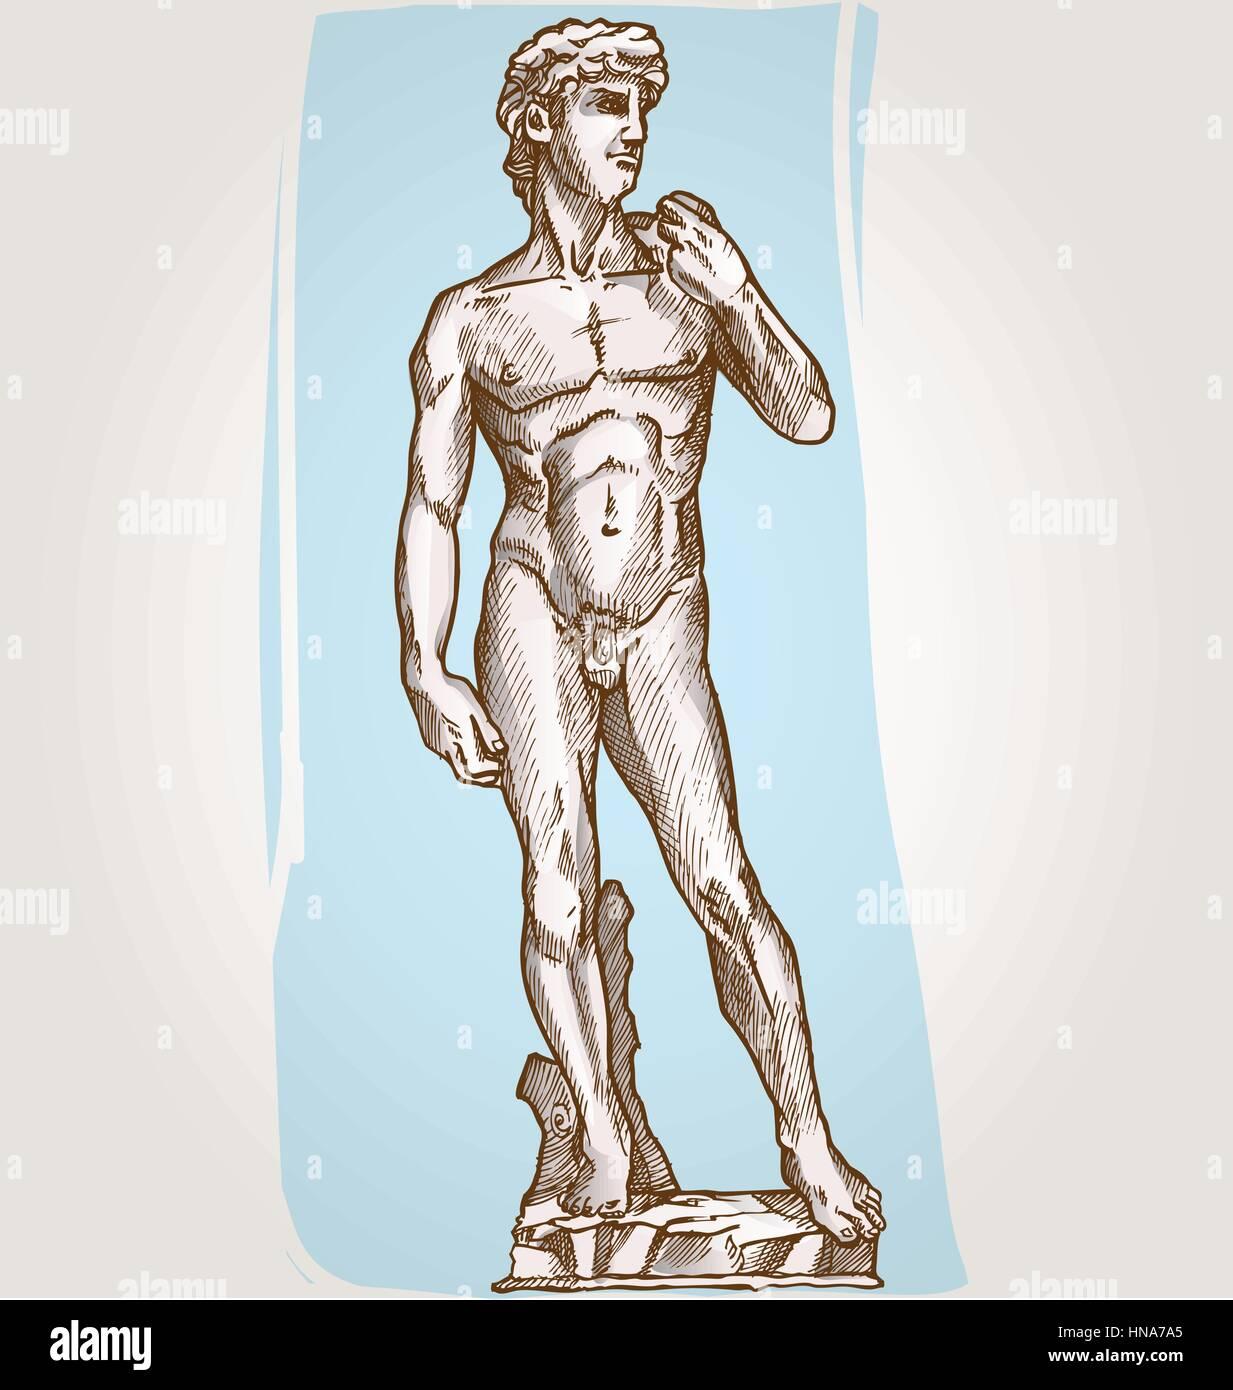 david statue of Michelangelo on blue background Stock Vector Art ...